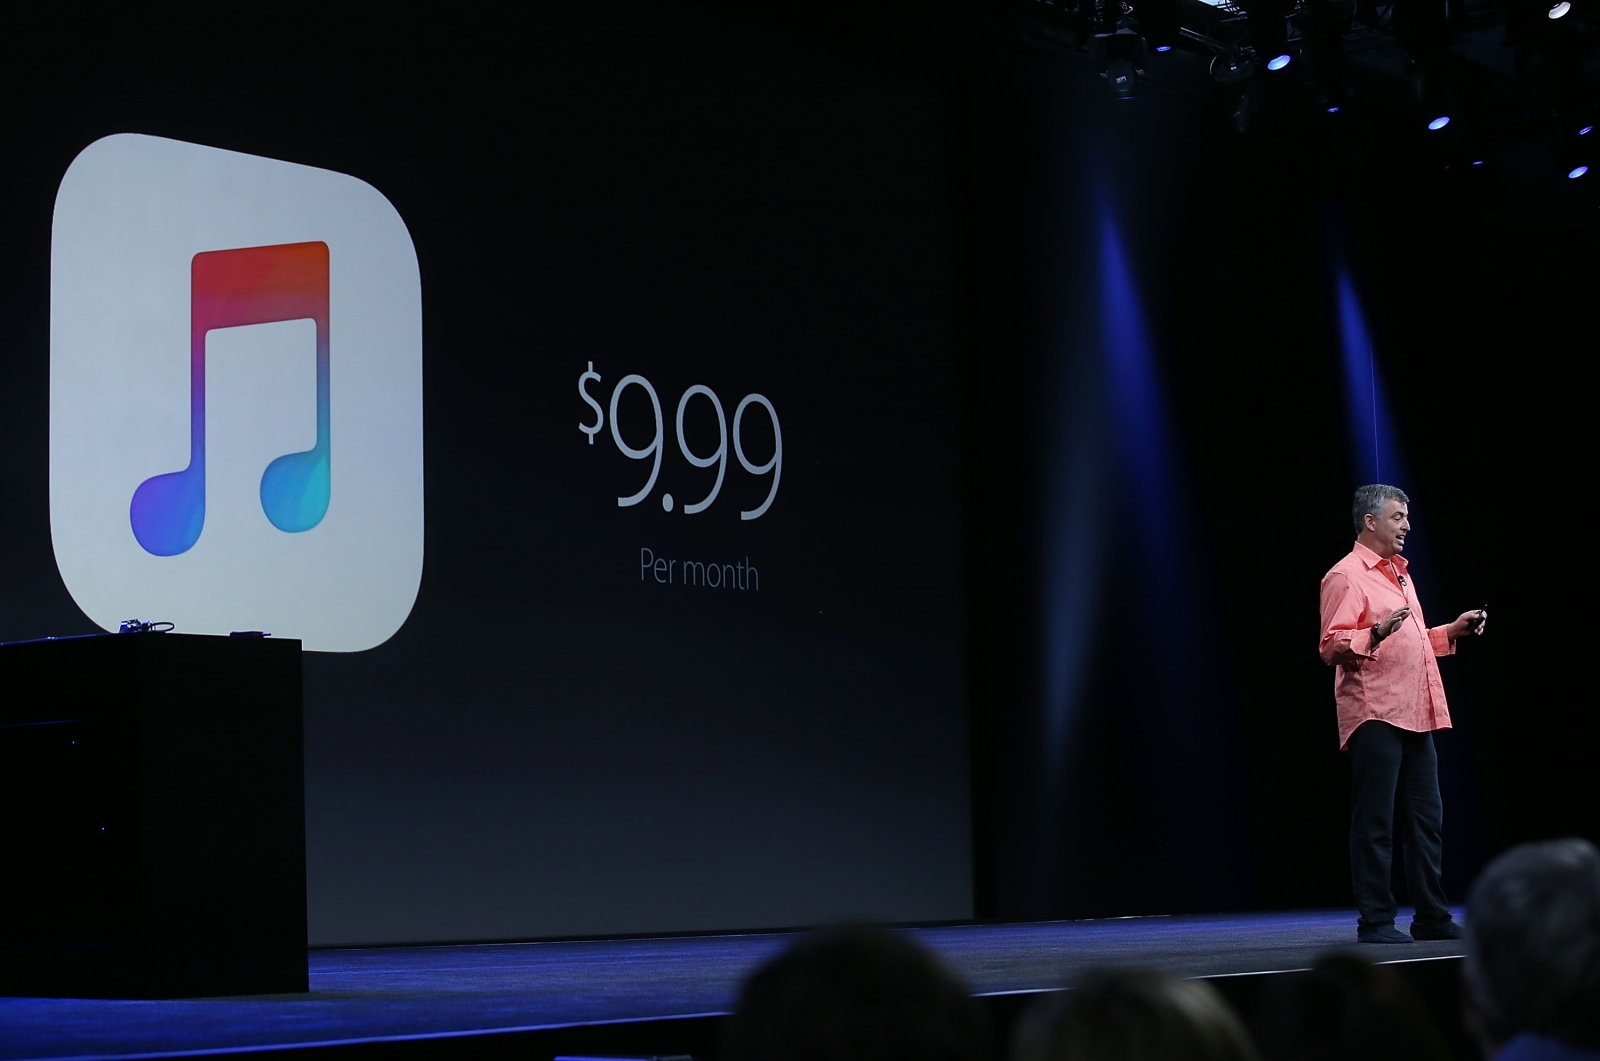 Apple Music is subject to antitrust investigations